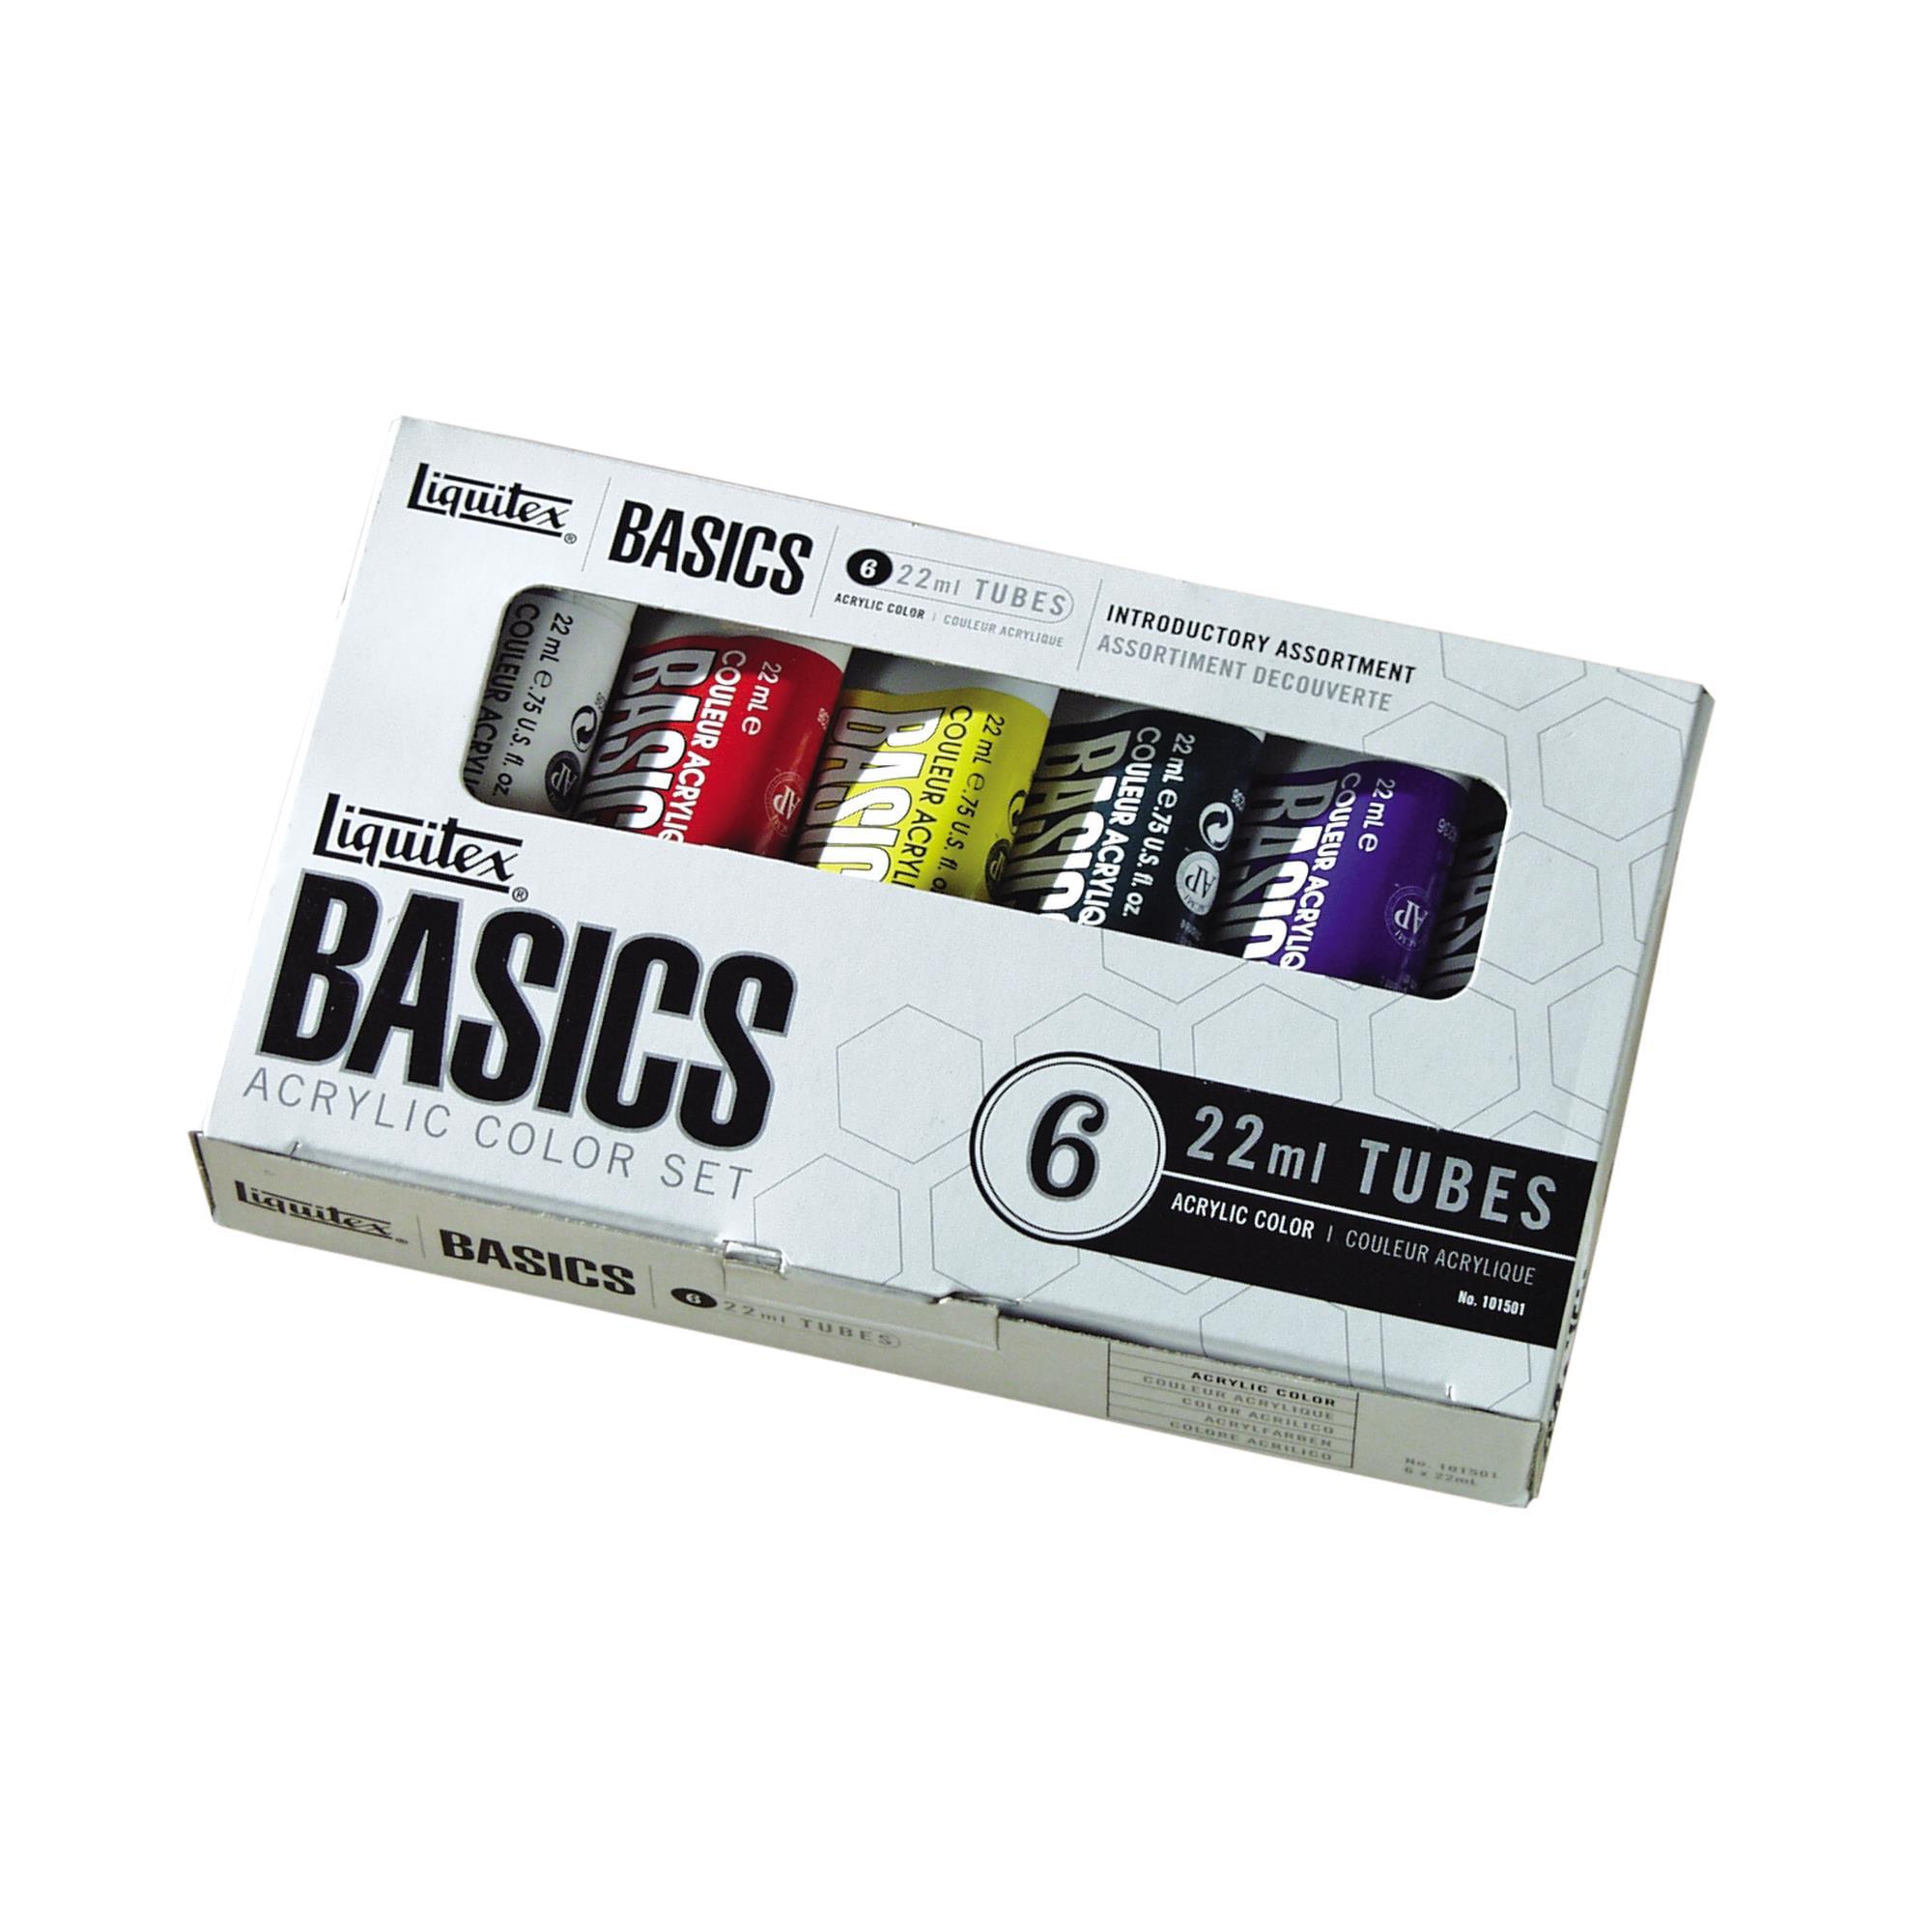 Liquitex BASICS Acrylic Paint 22ml/Tube, 6-Piece Set